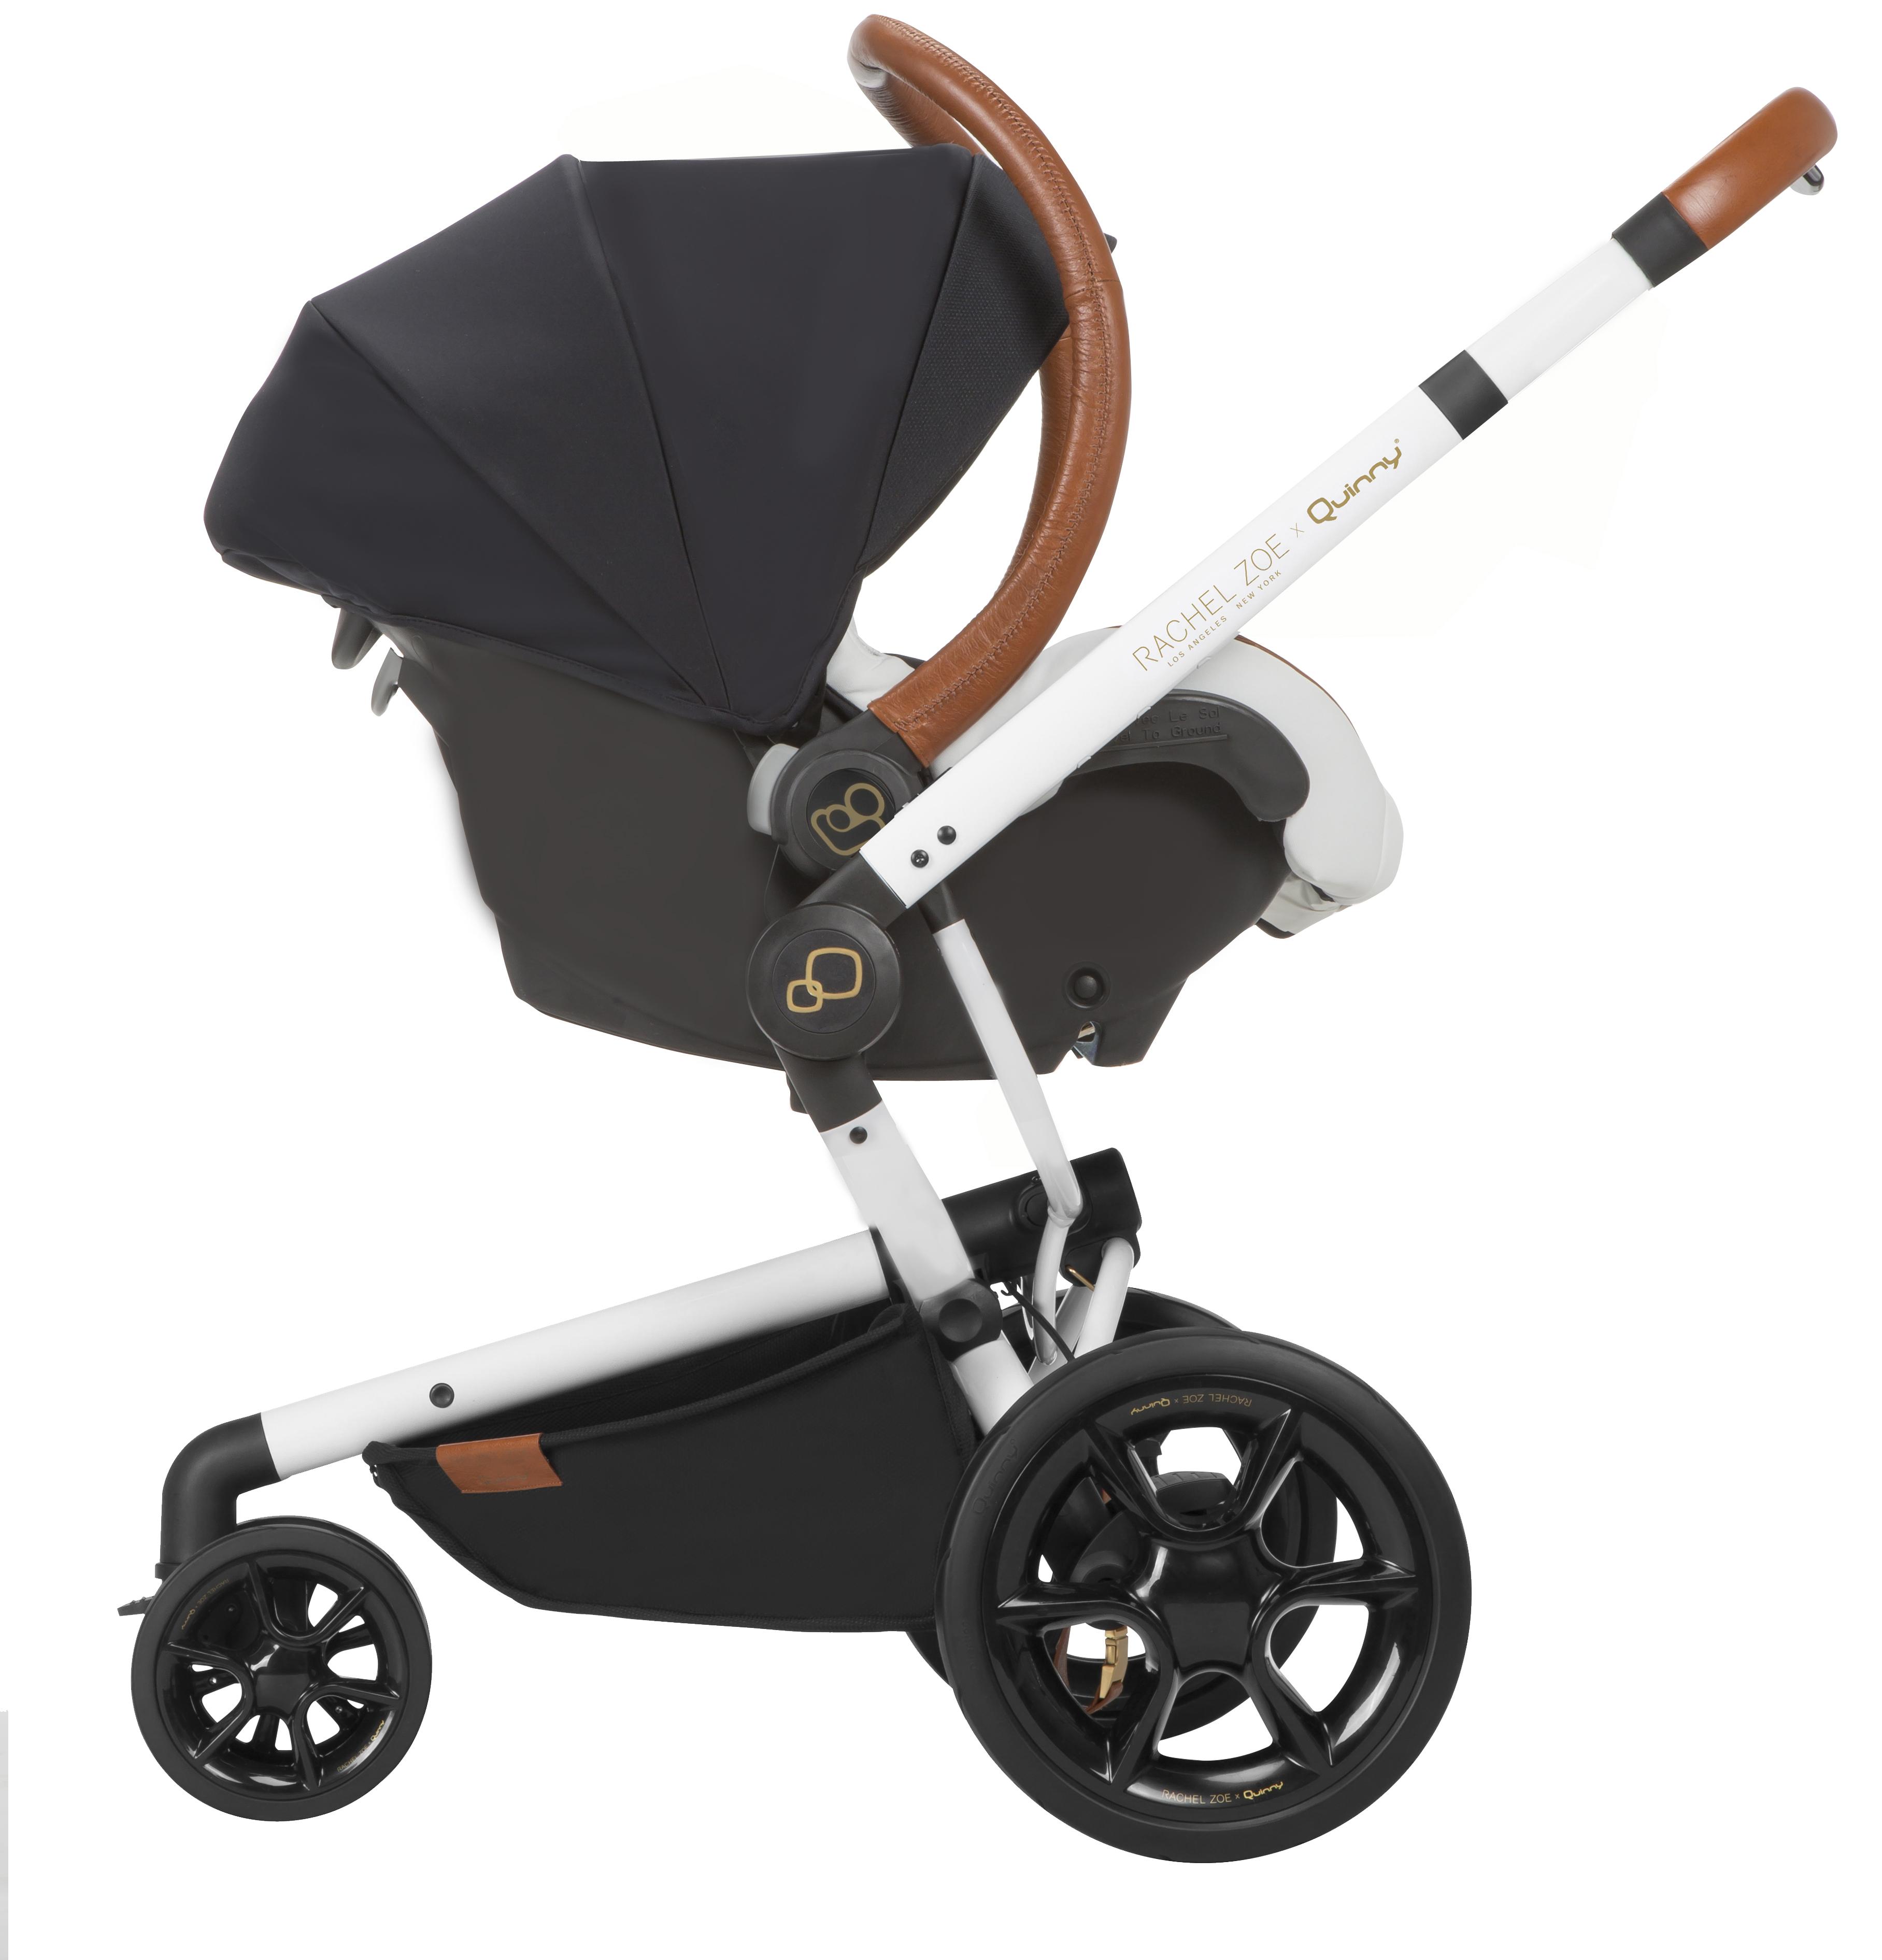 Quinny Moodd Stroller by Rachel Zoe, Jet Set - Ideal Baby